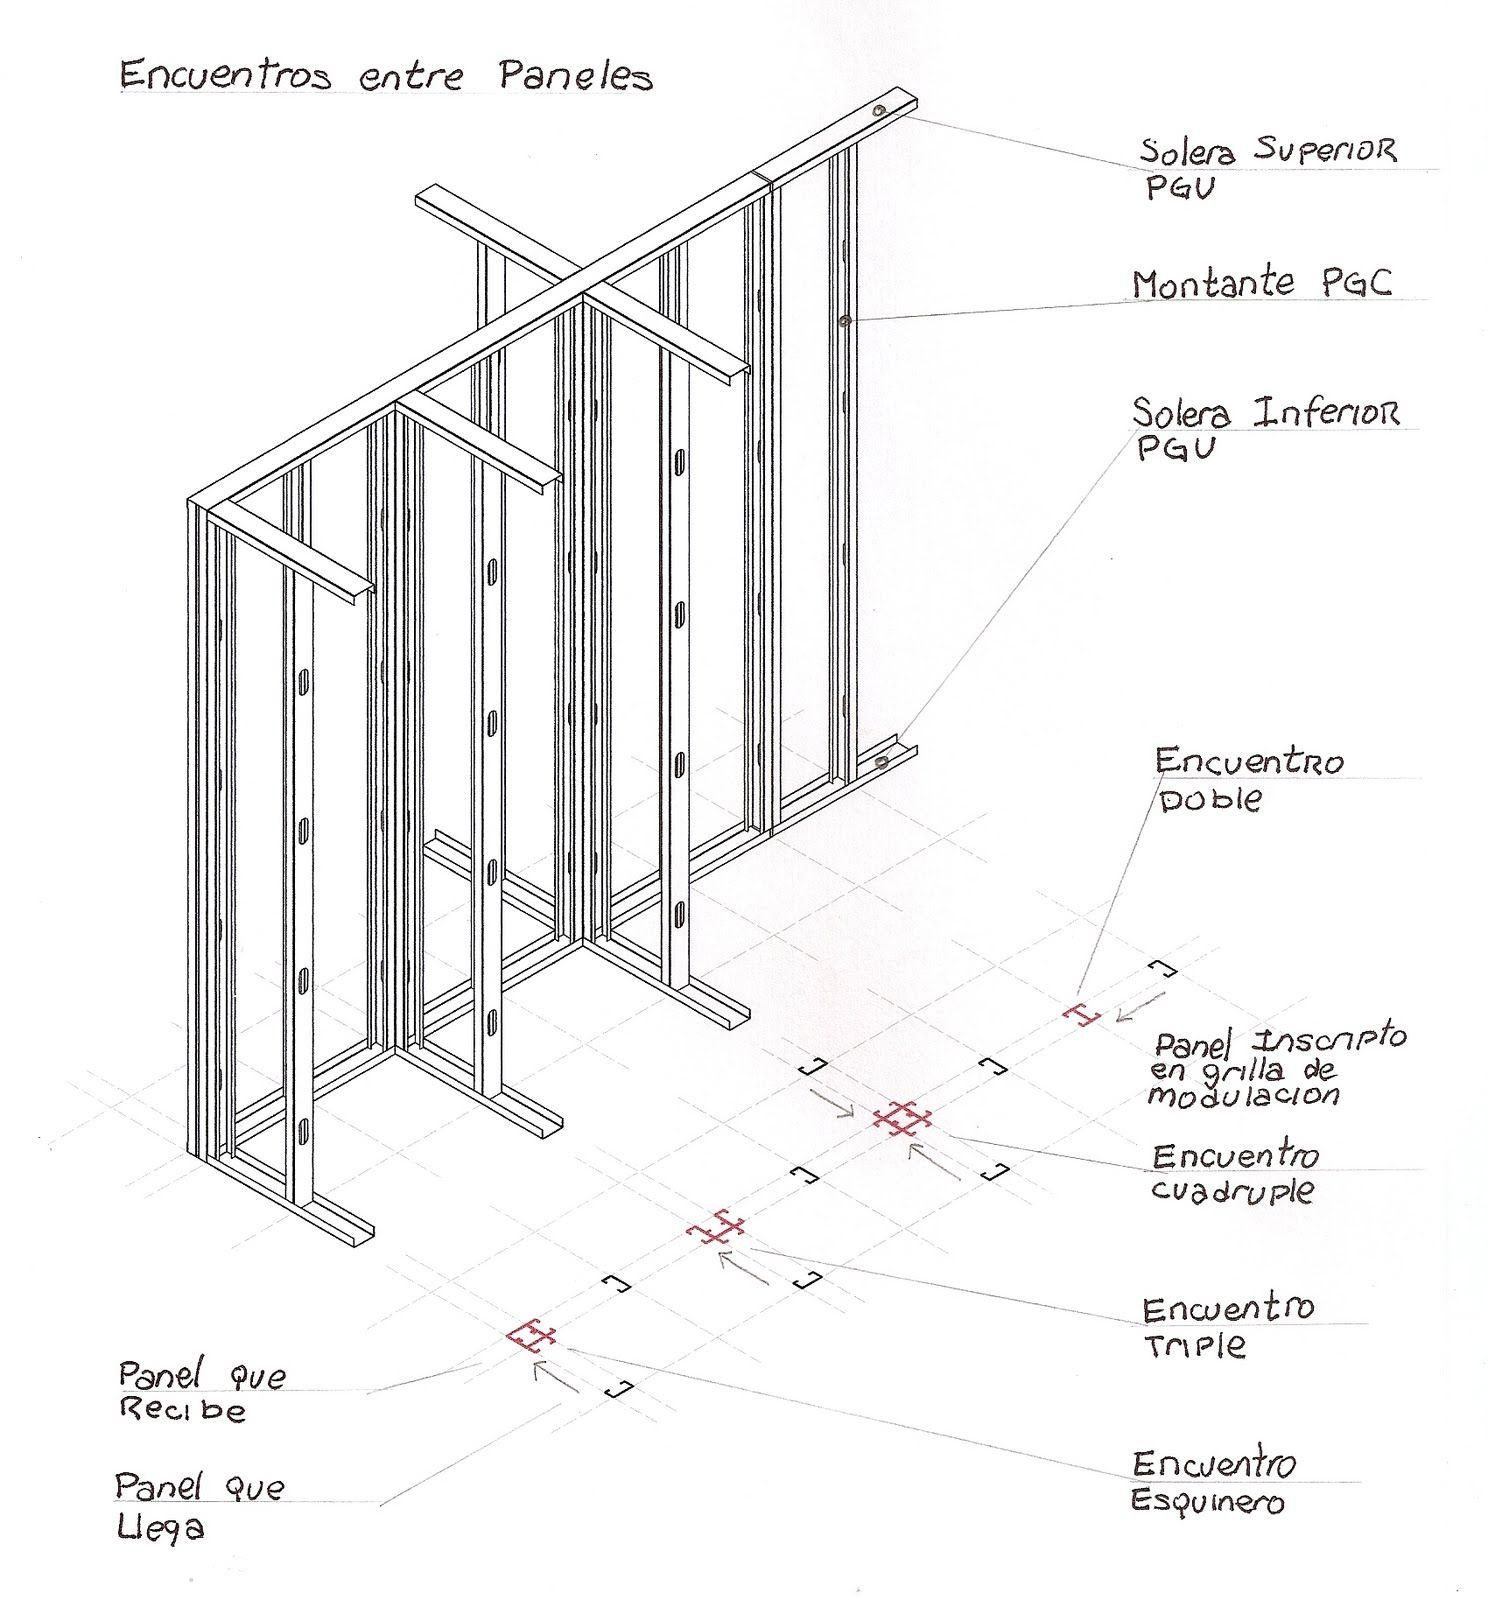 Construcciones Paneles Building Technology For